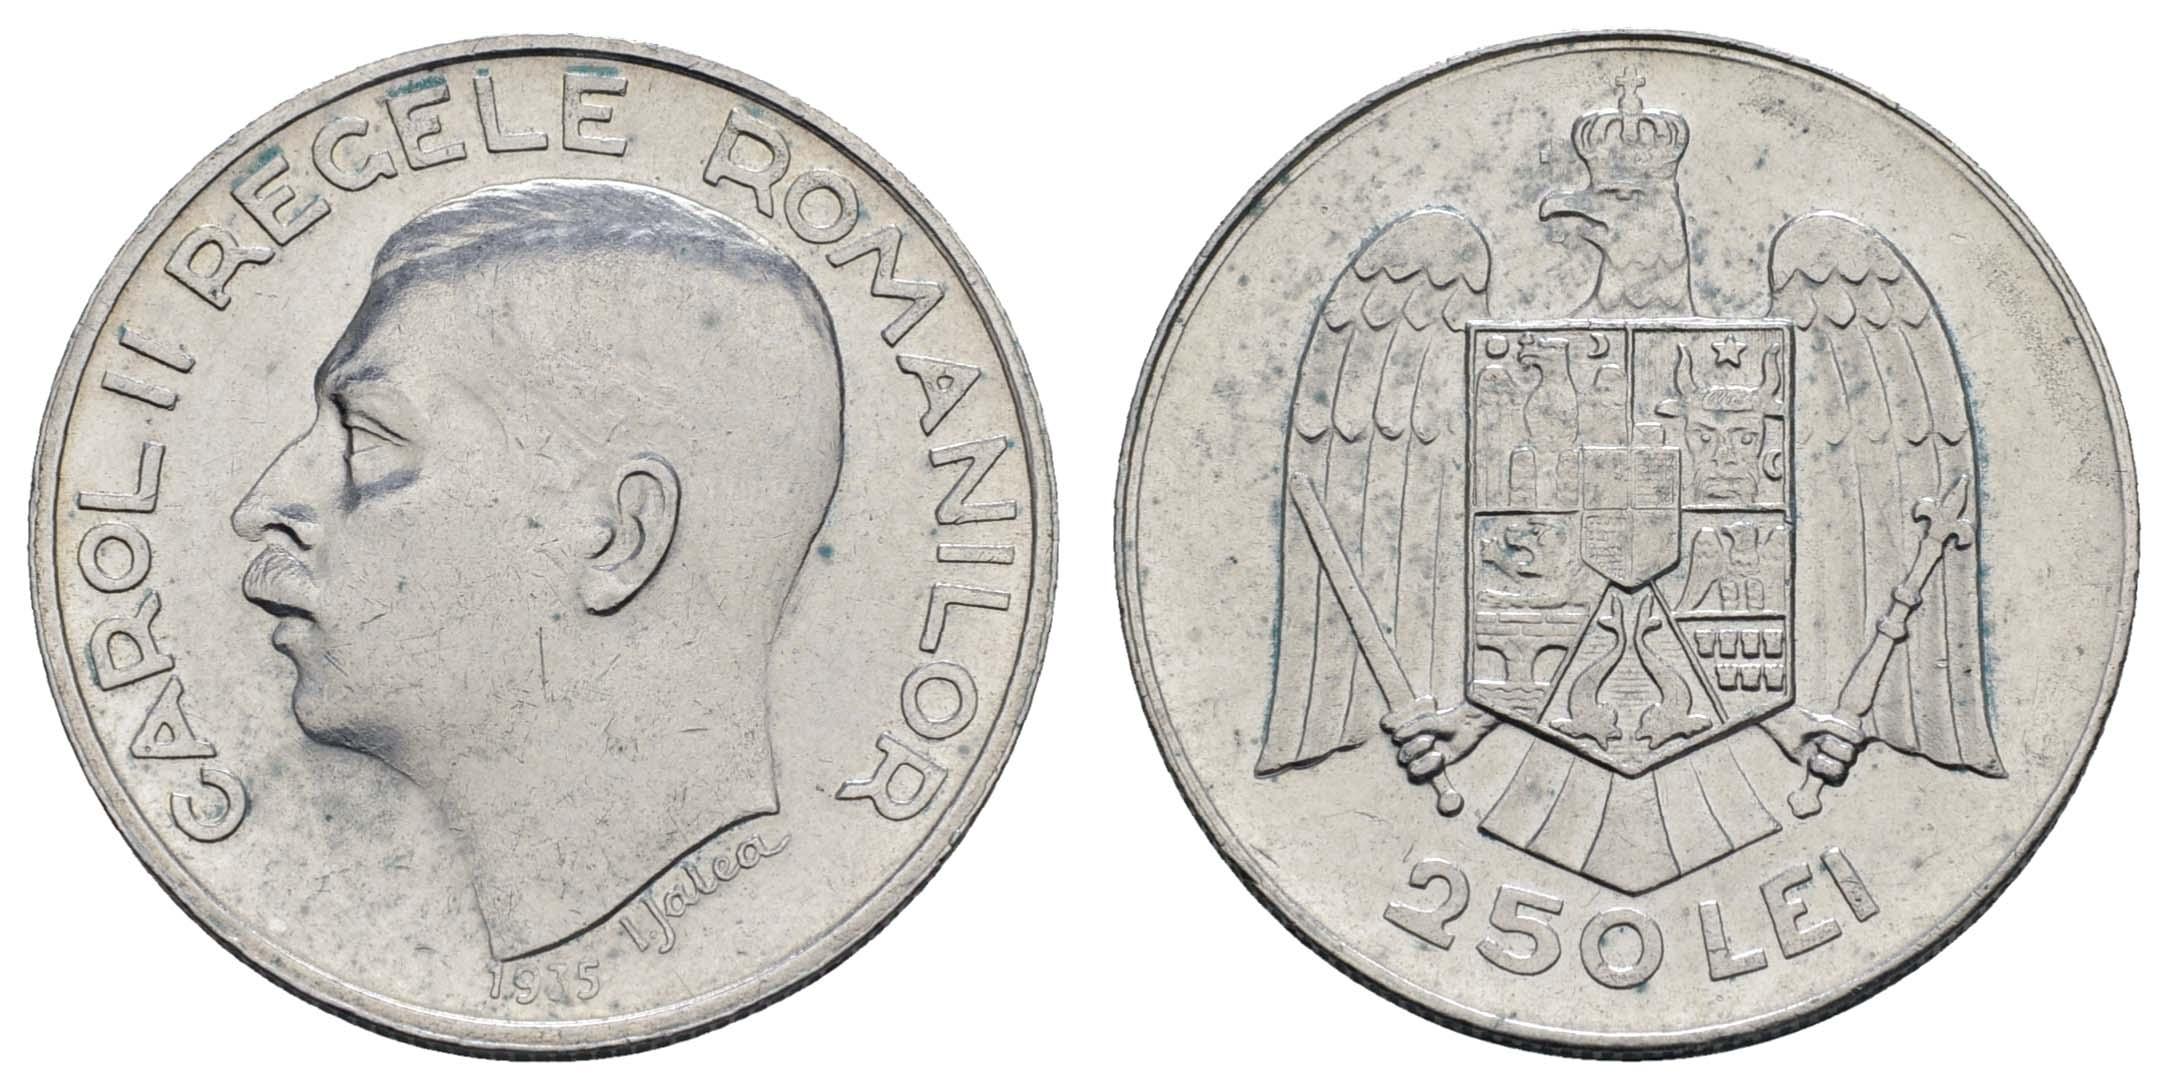 Lot 1731 - europa ab 1800 - Rumänien -  Auktionshaus Ulrich Felzmann GmbH & Co. KG Coins single lots